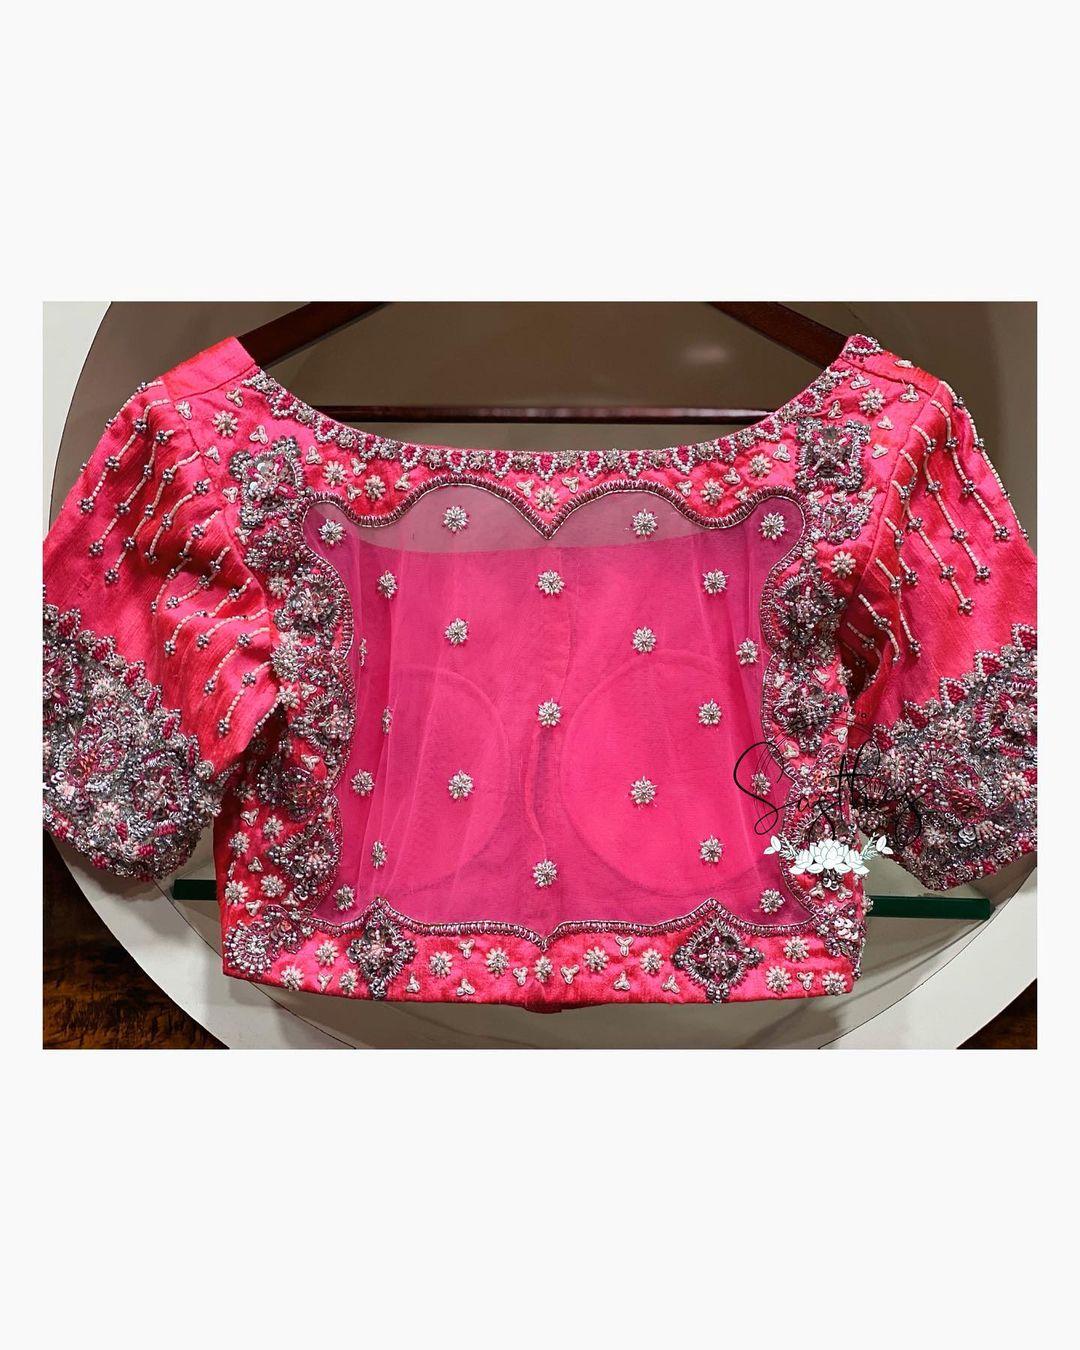 Stunning sheer back designer blouse with floral buti design silver thread aari work. 2021-04-25